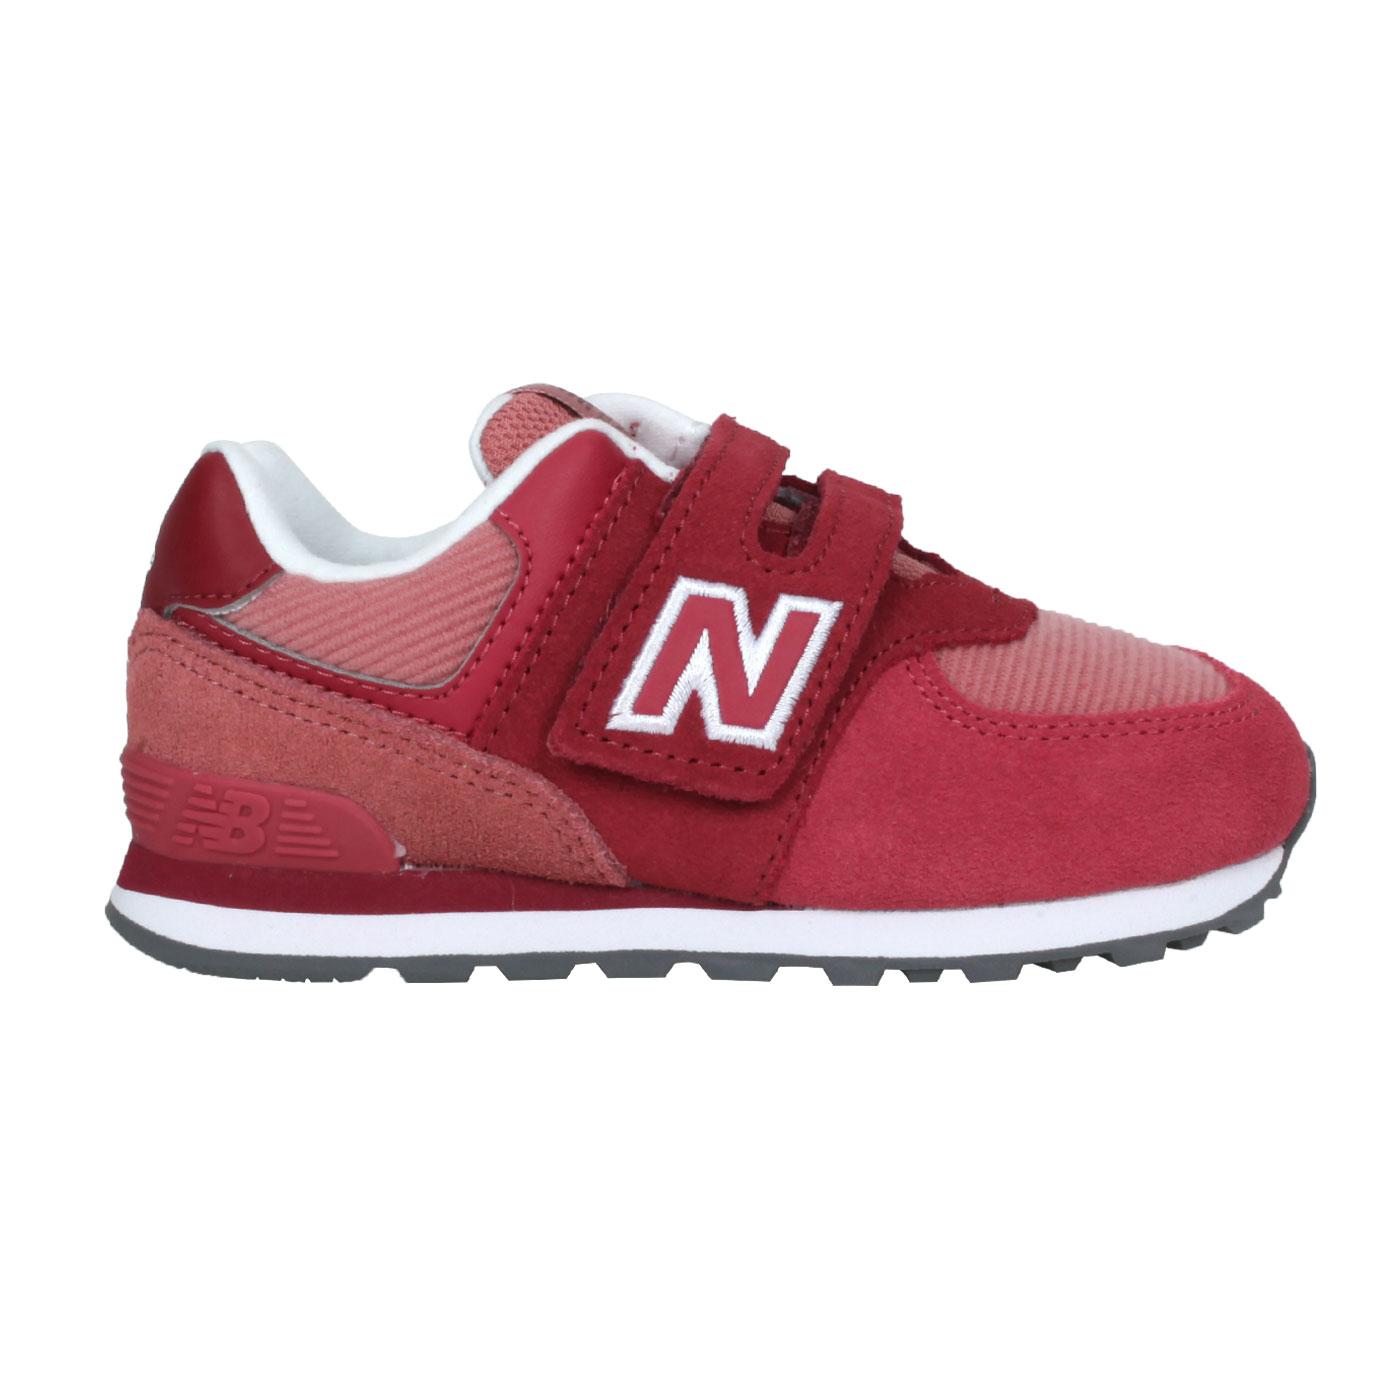 NEW BALANCE 小童休閒運動鞋-WIDE IV574WT1